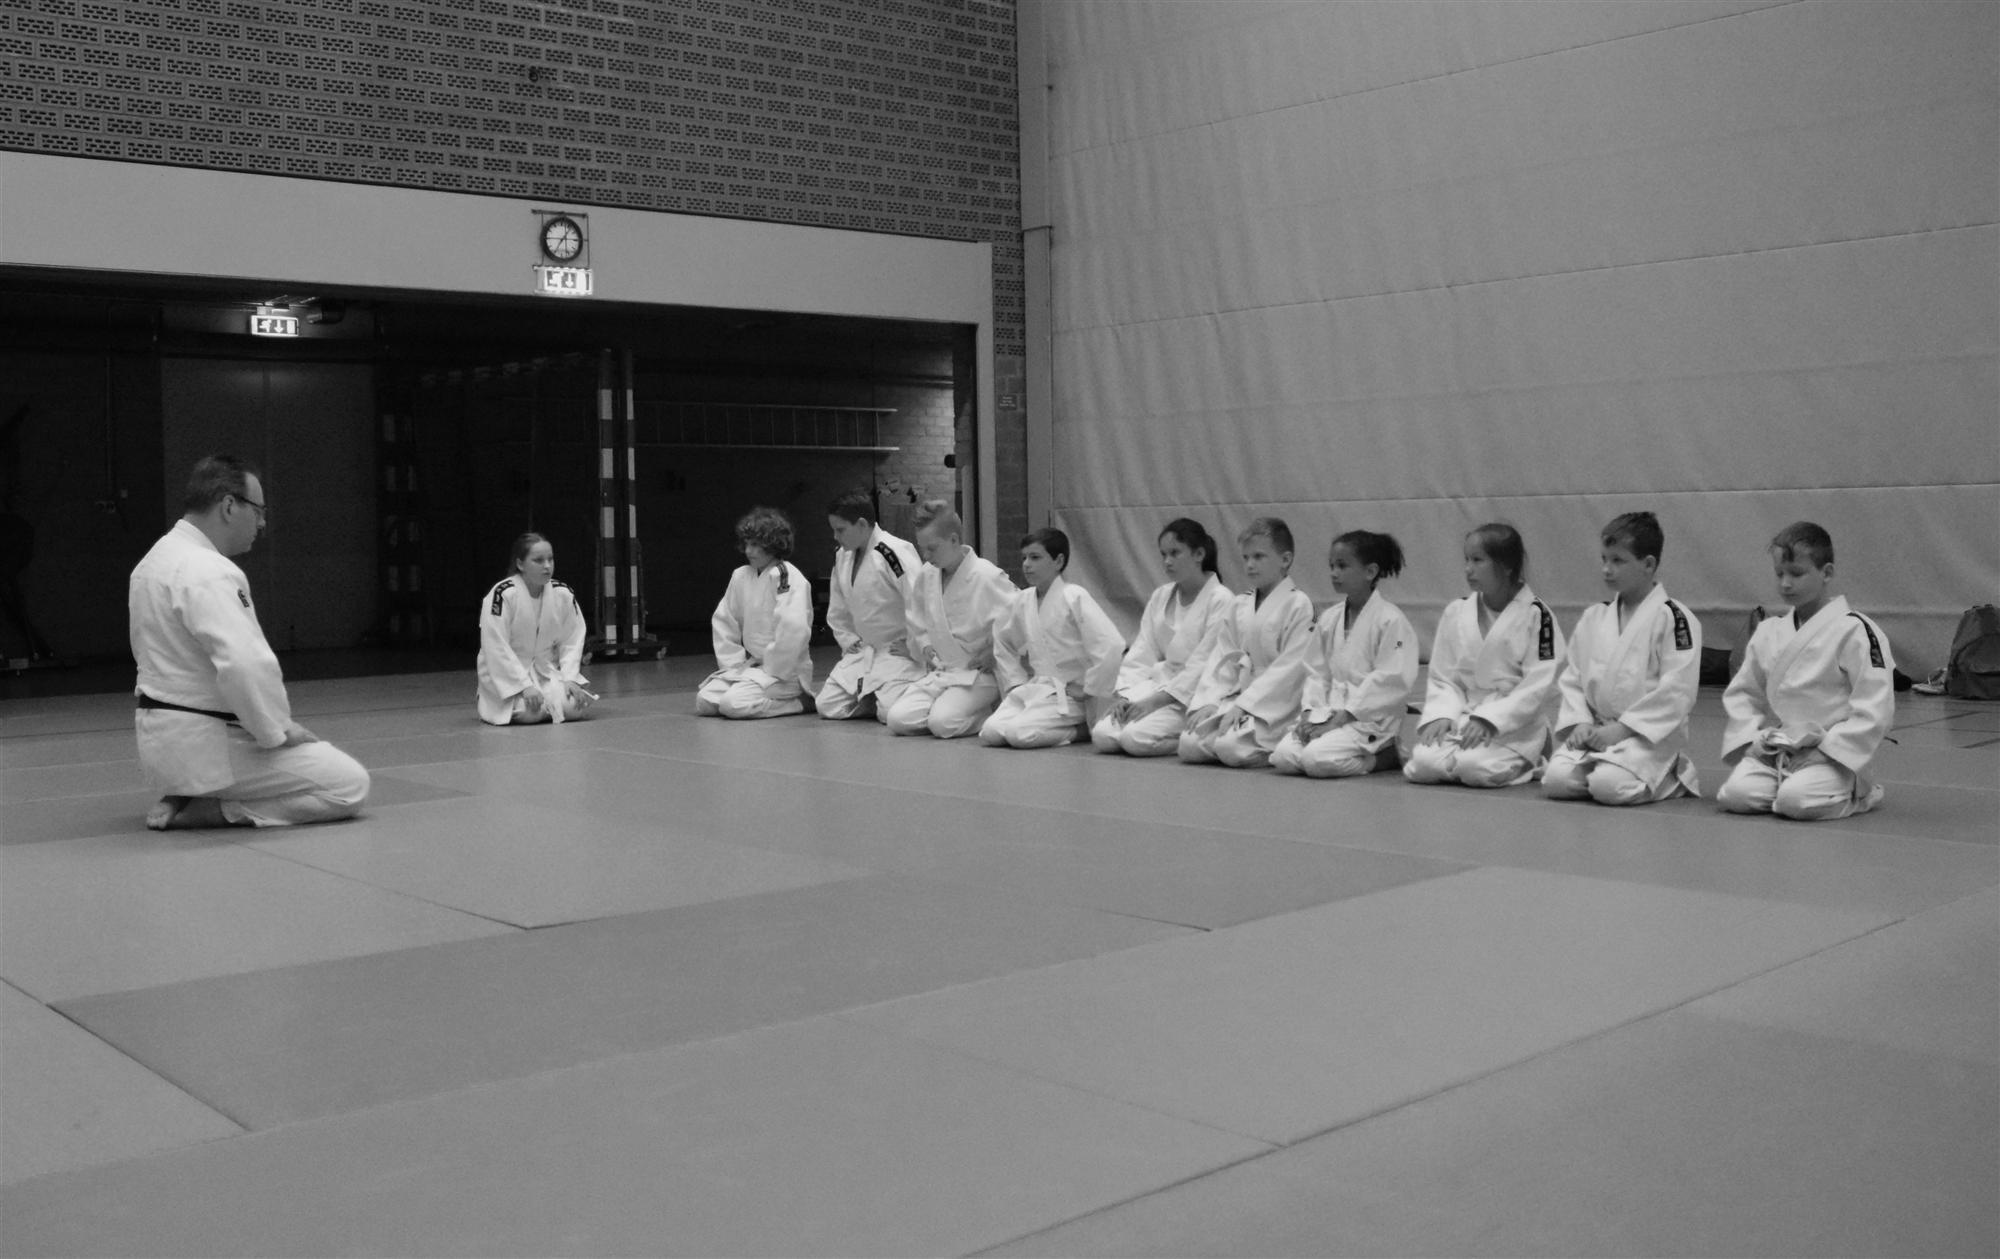 http://judoclubbrunssum.nl/iw-courses/m1/